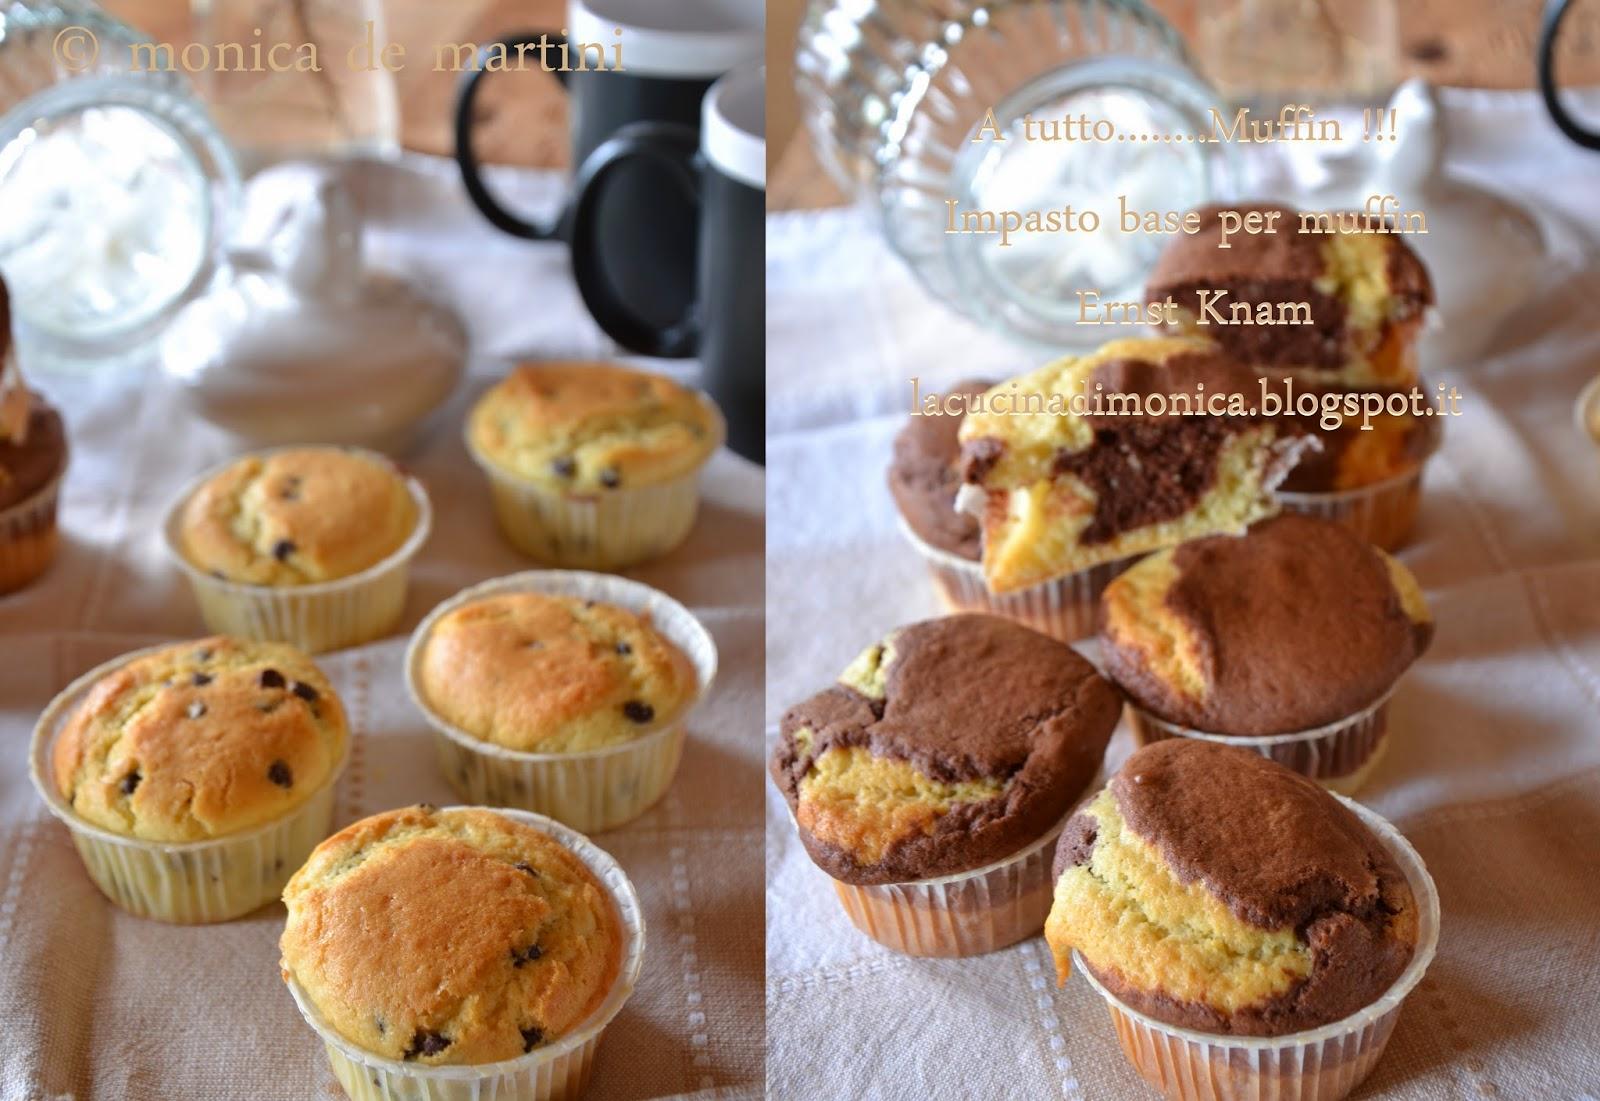 a tutto........muffin !!! impasto base per muffin di ernst knam